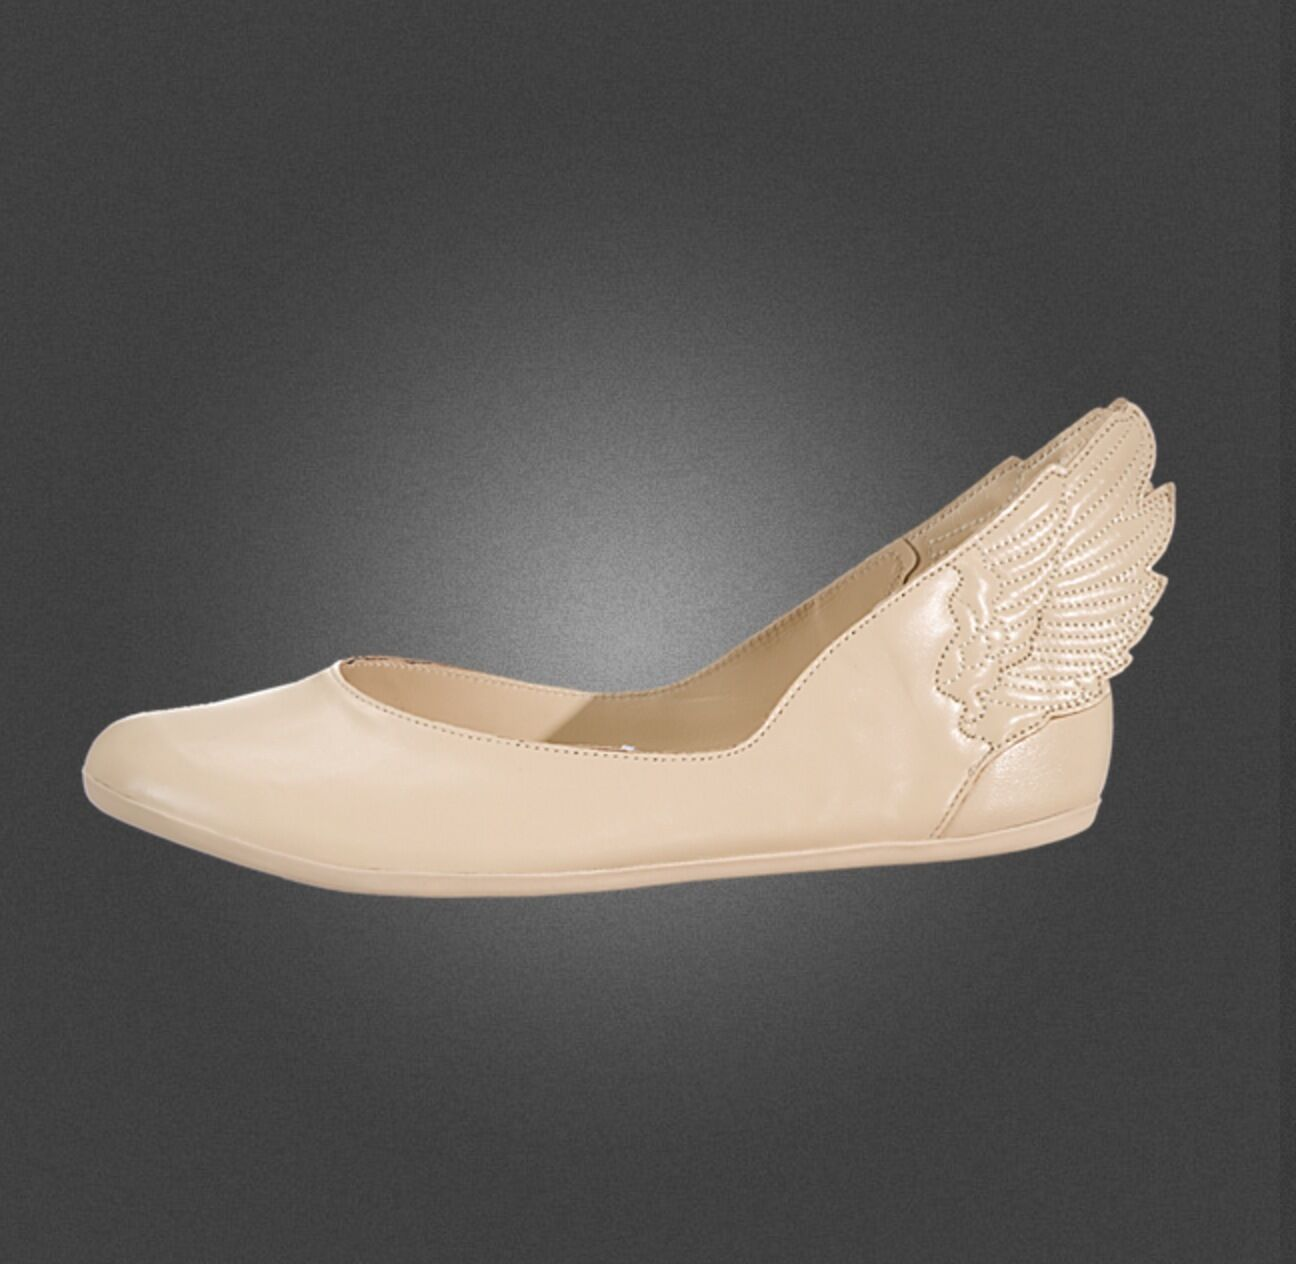 Nuova 5 adidas jeremy scott donne / js ali ballerine dune / donne in bianco q23666 232862